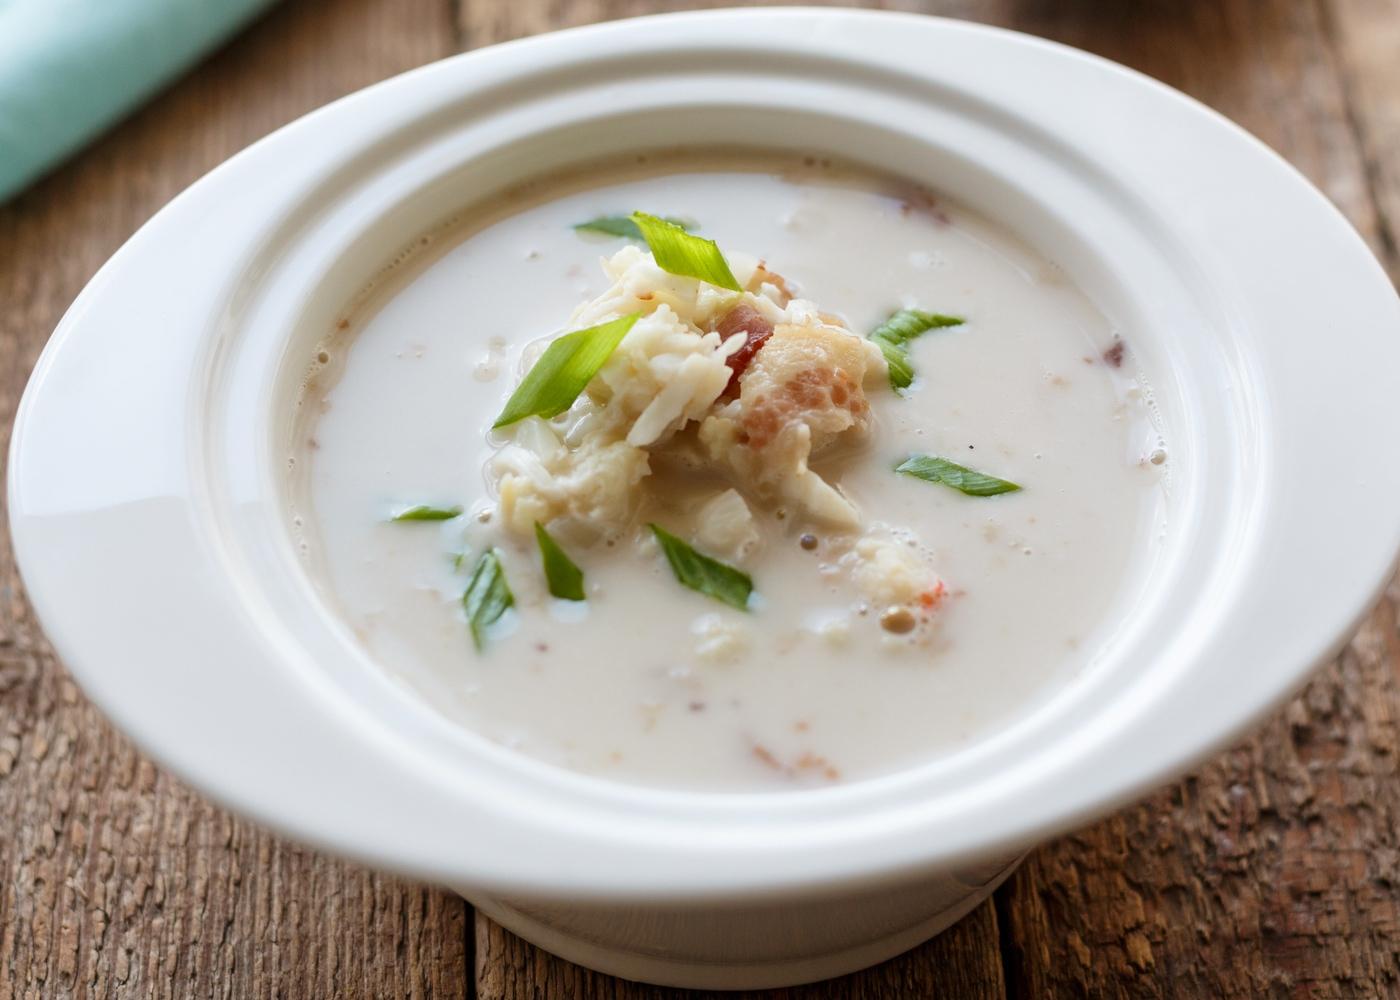 Sopa de peixe com arroz servida numa taça